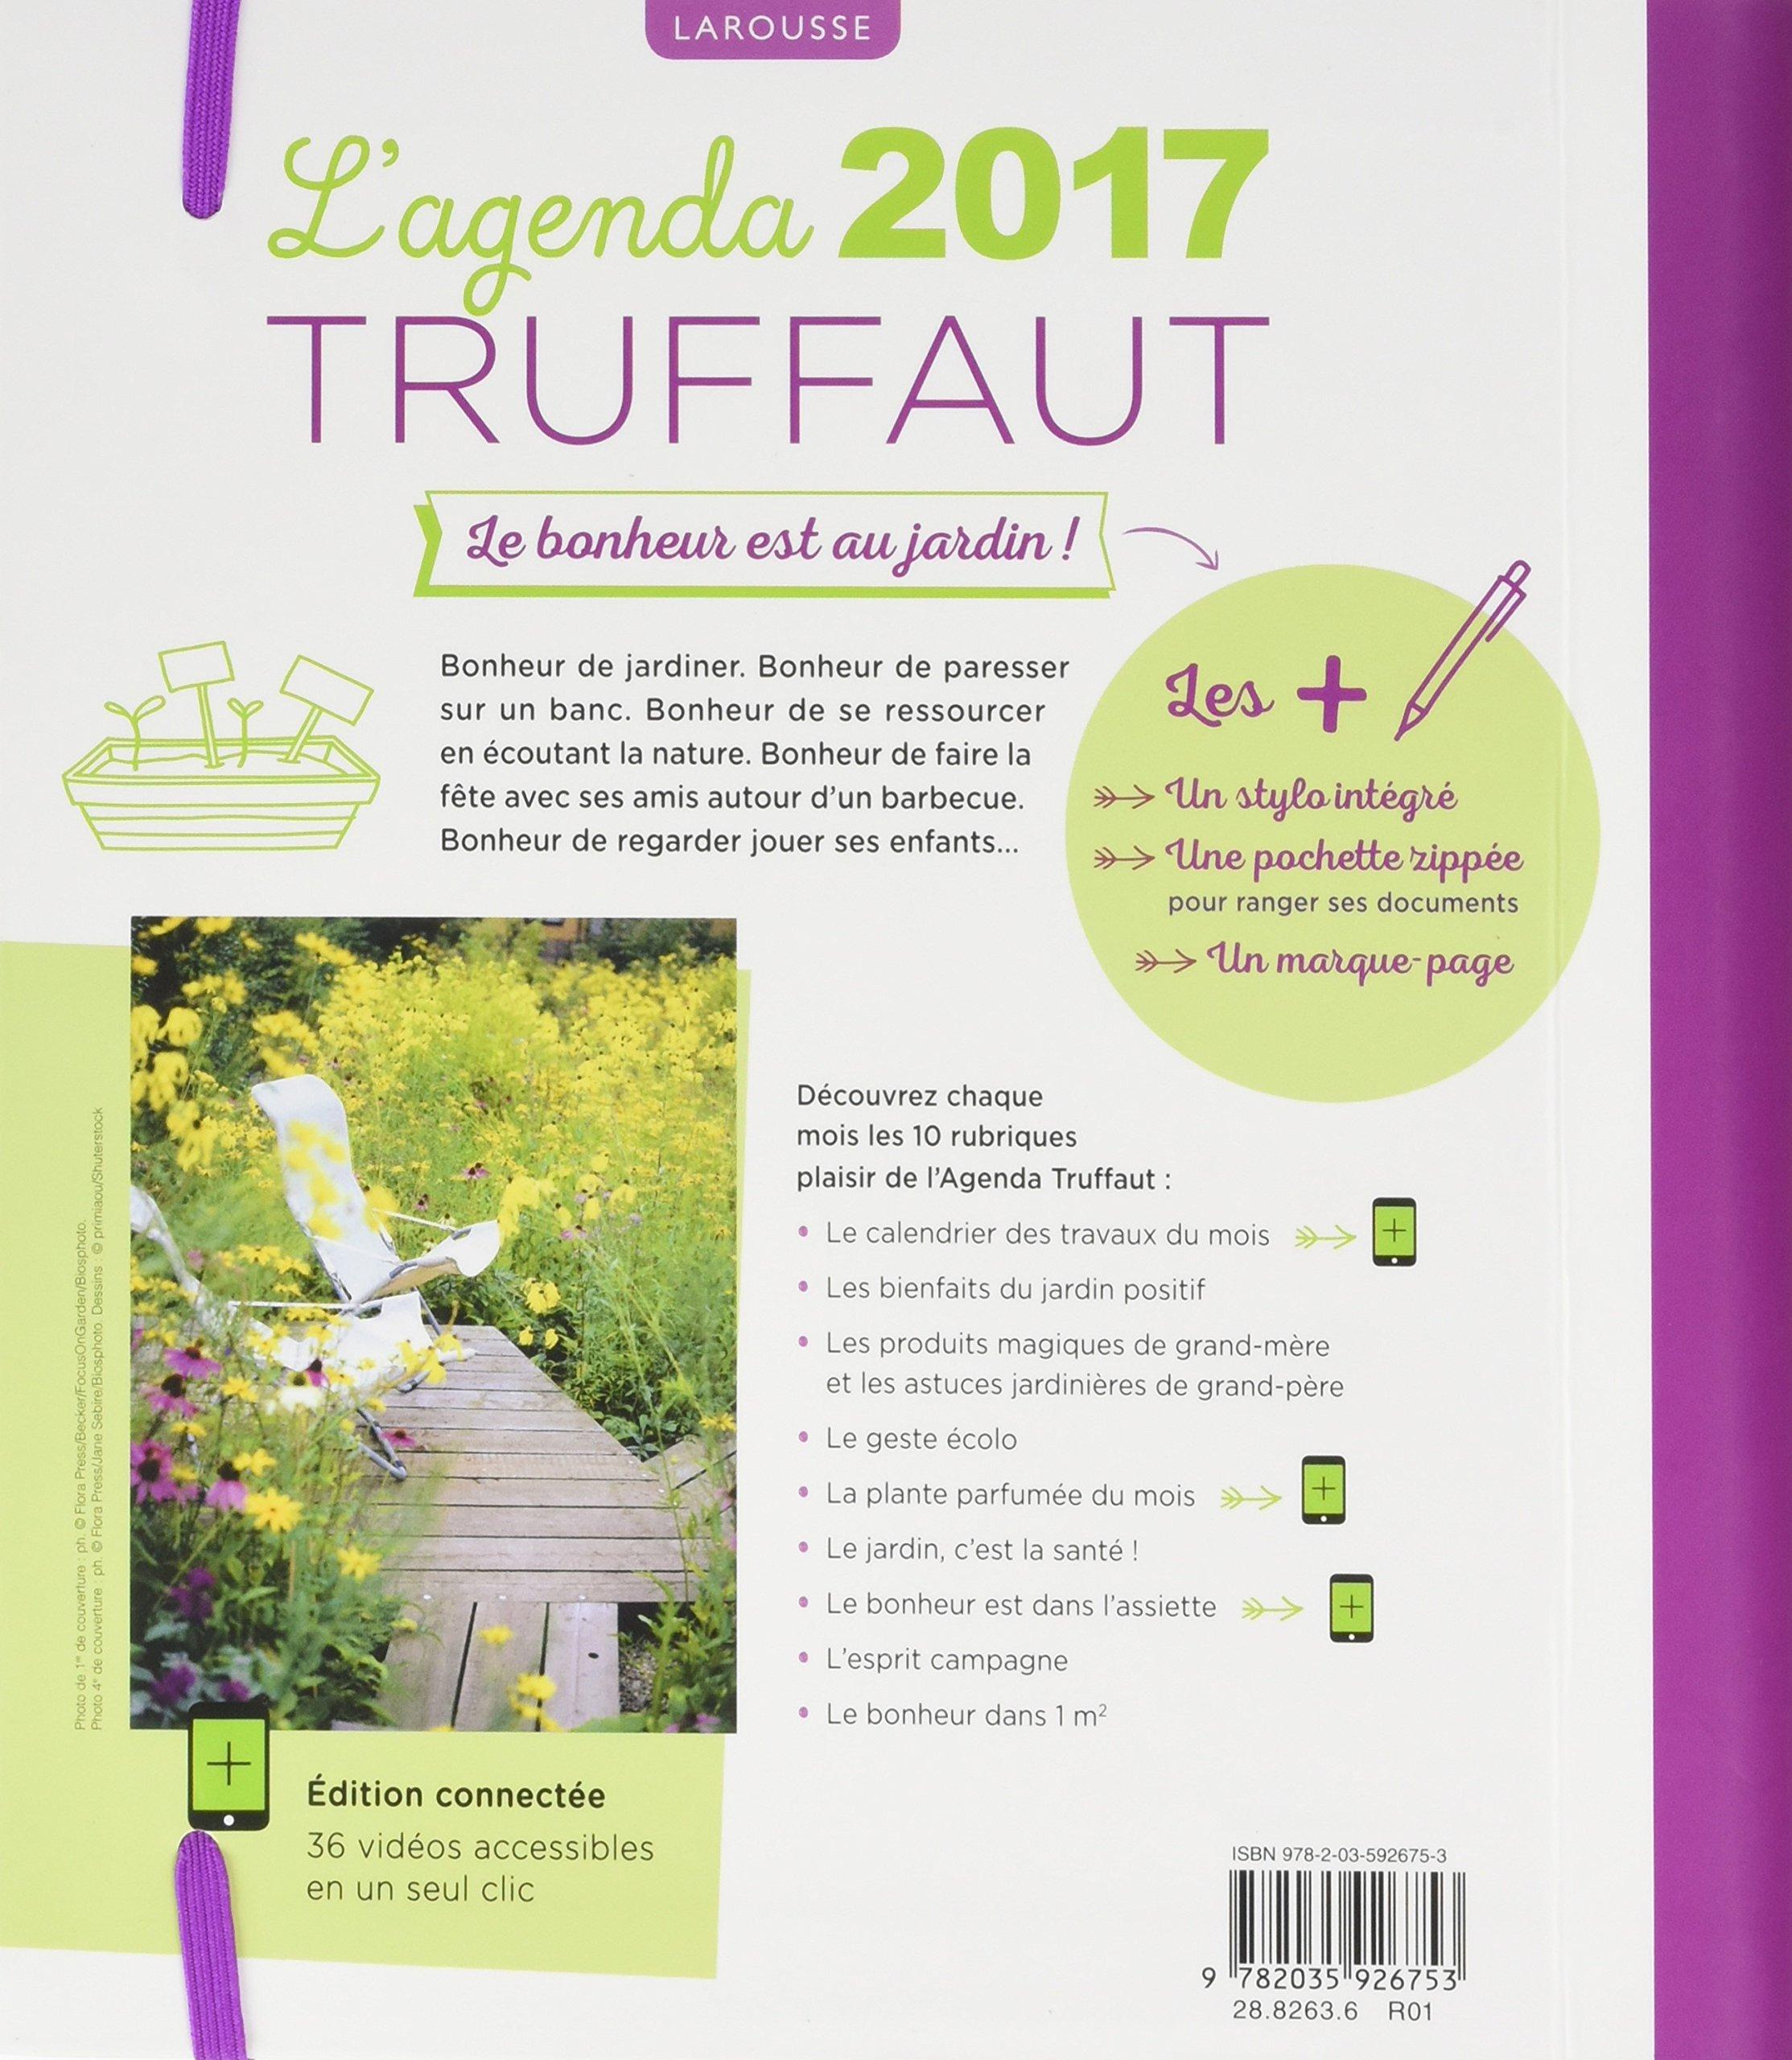 Larousse Lagenda 2017 Truffaut : Le bonheur est au jardin ...